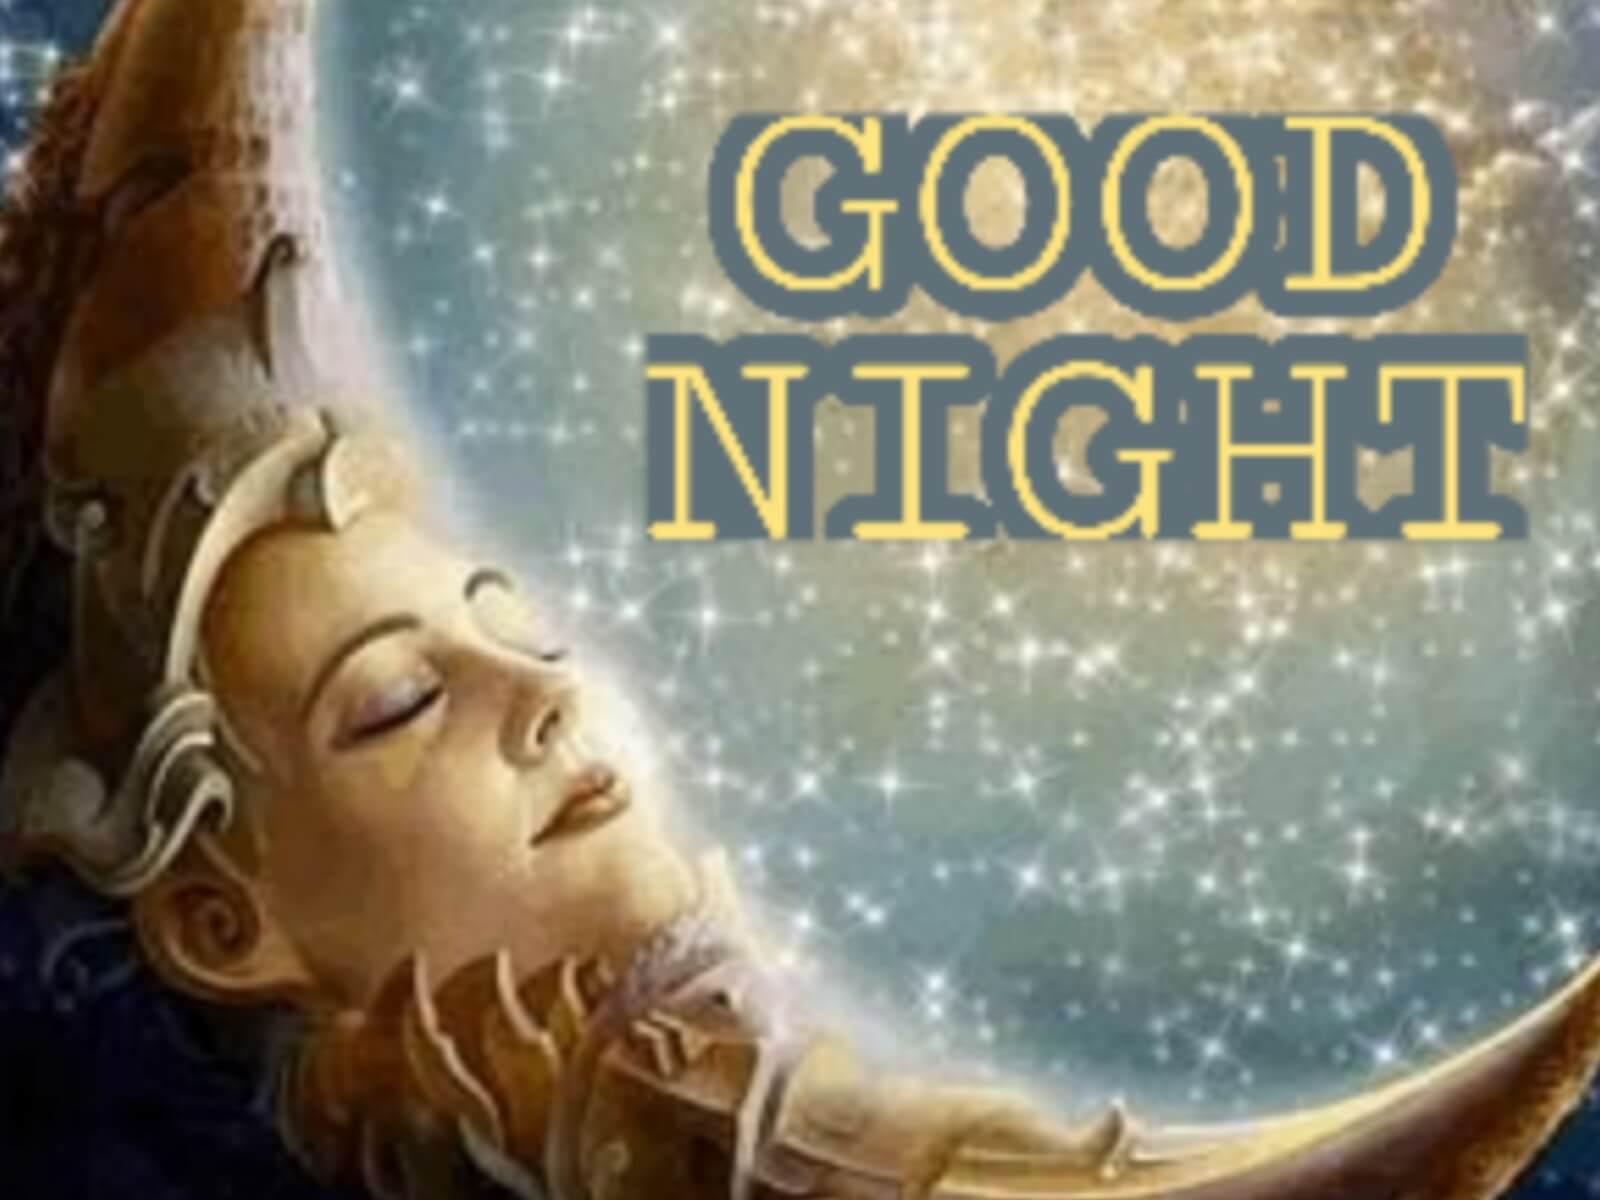 good night love image download